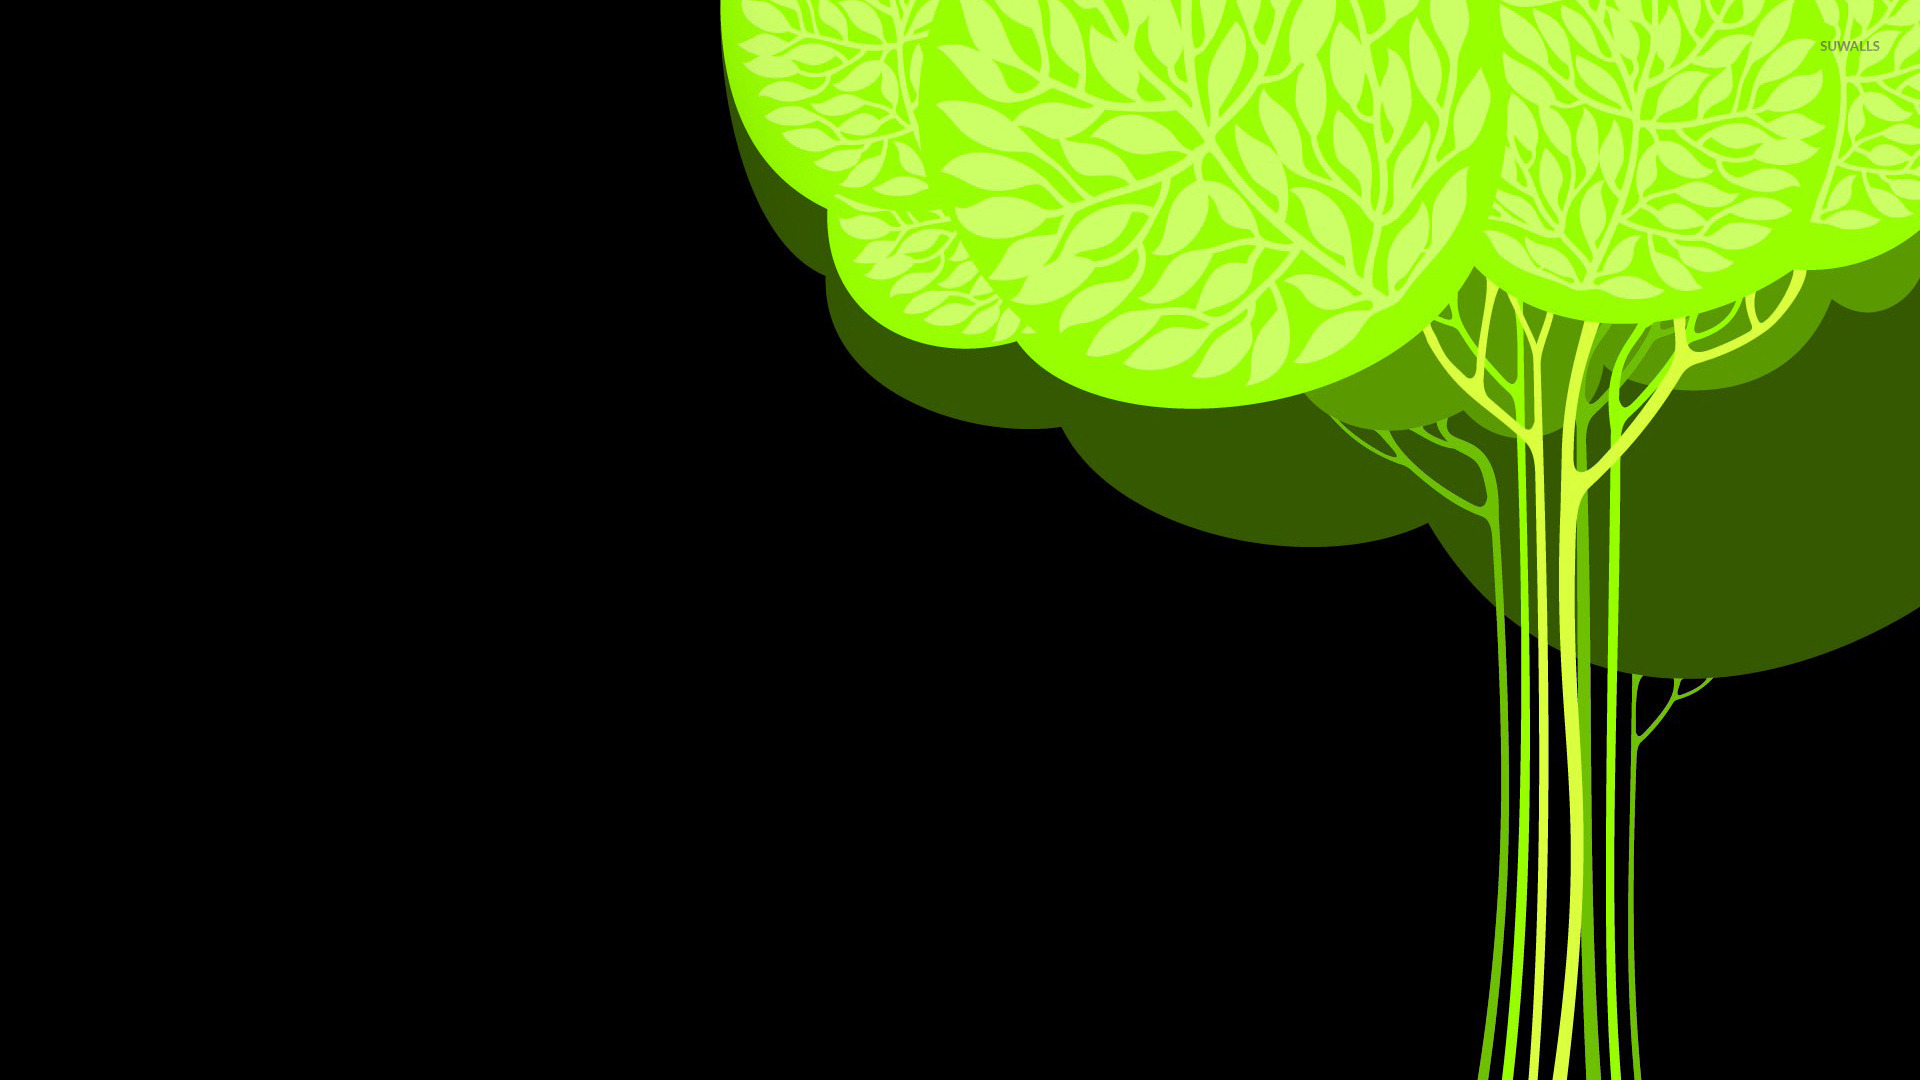 green tree 3 wallpaper vector wallpapers 20224